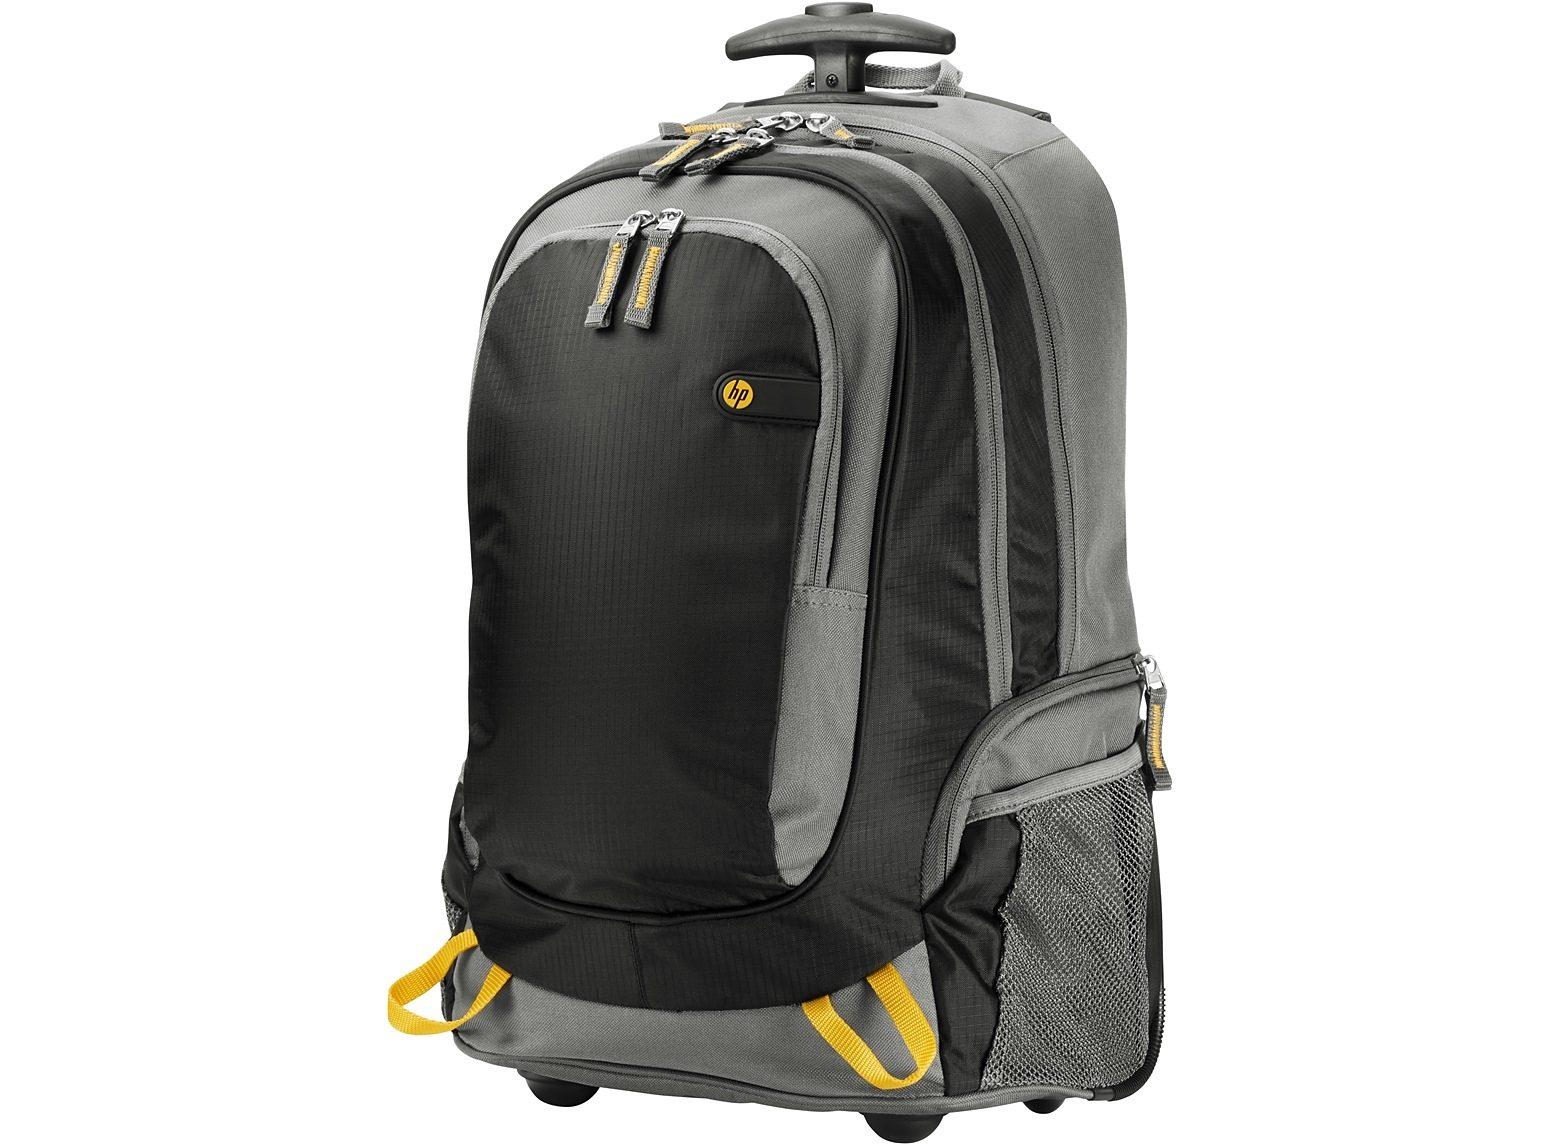 HP Tasche »Rollenrucksack, 15,6 Zoll«